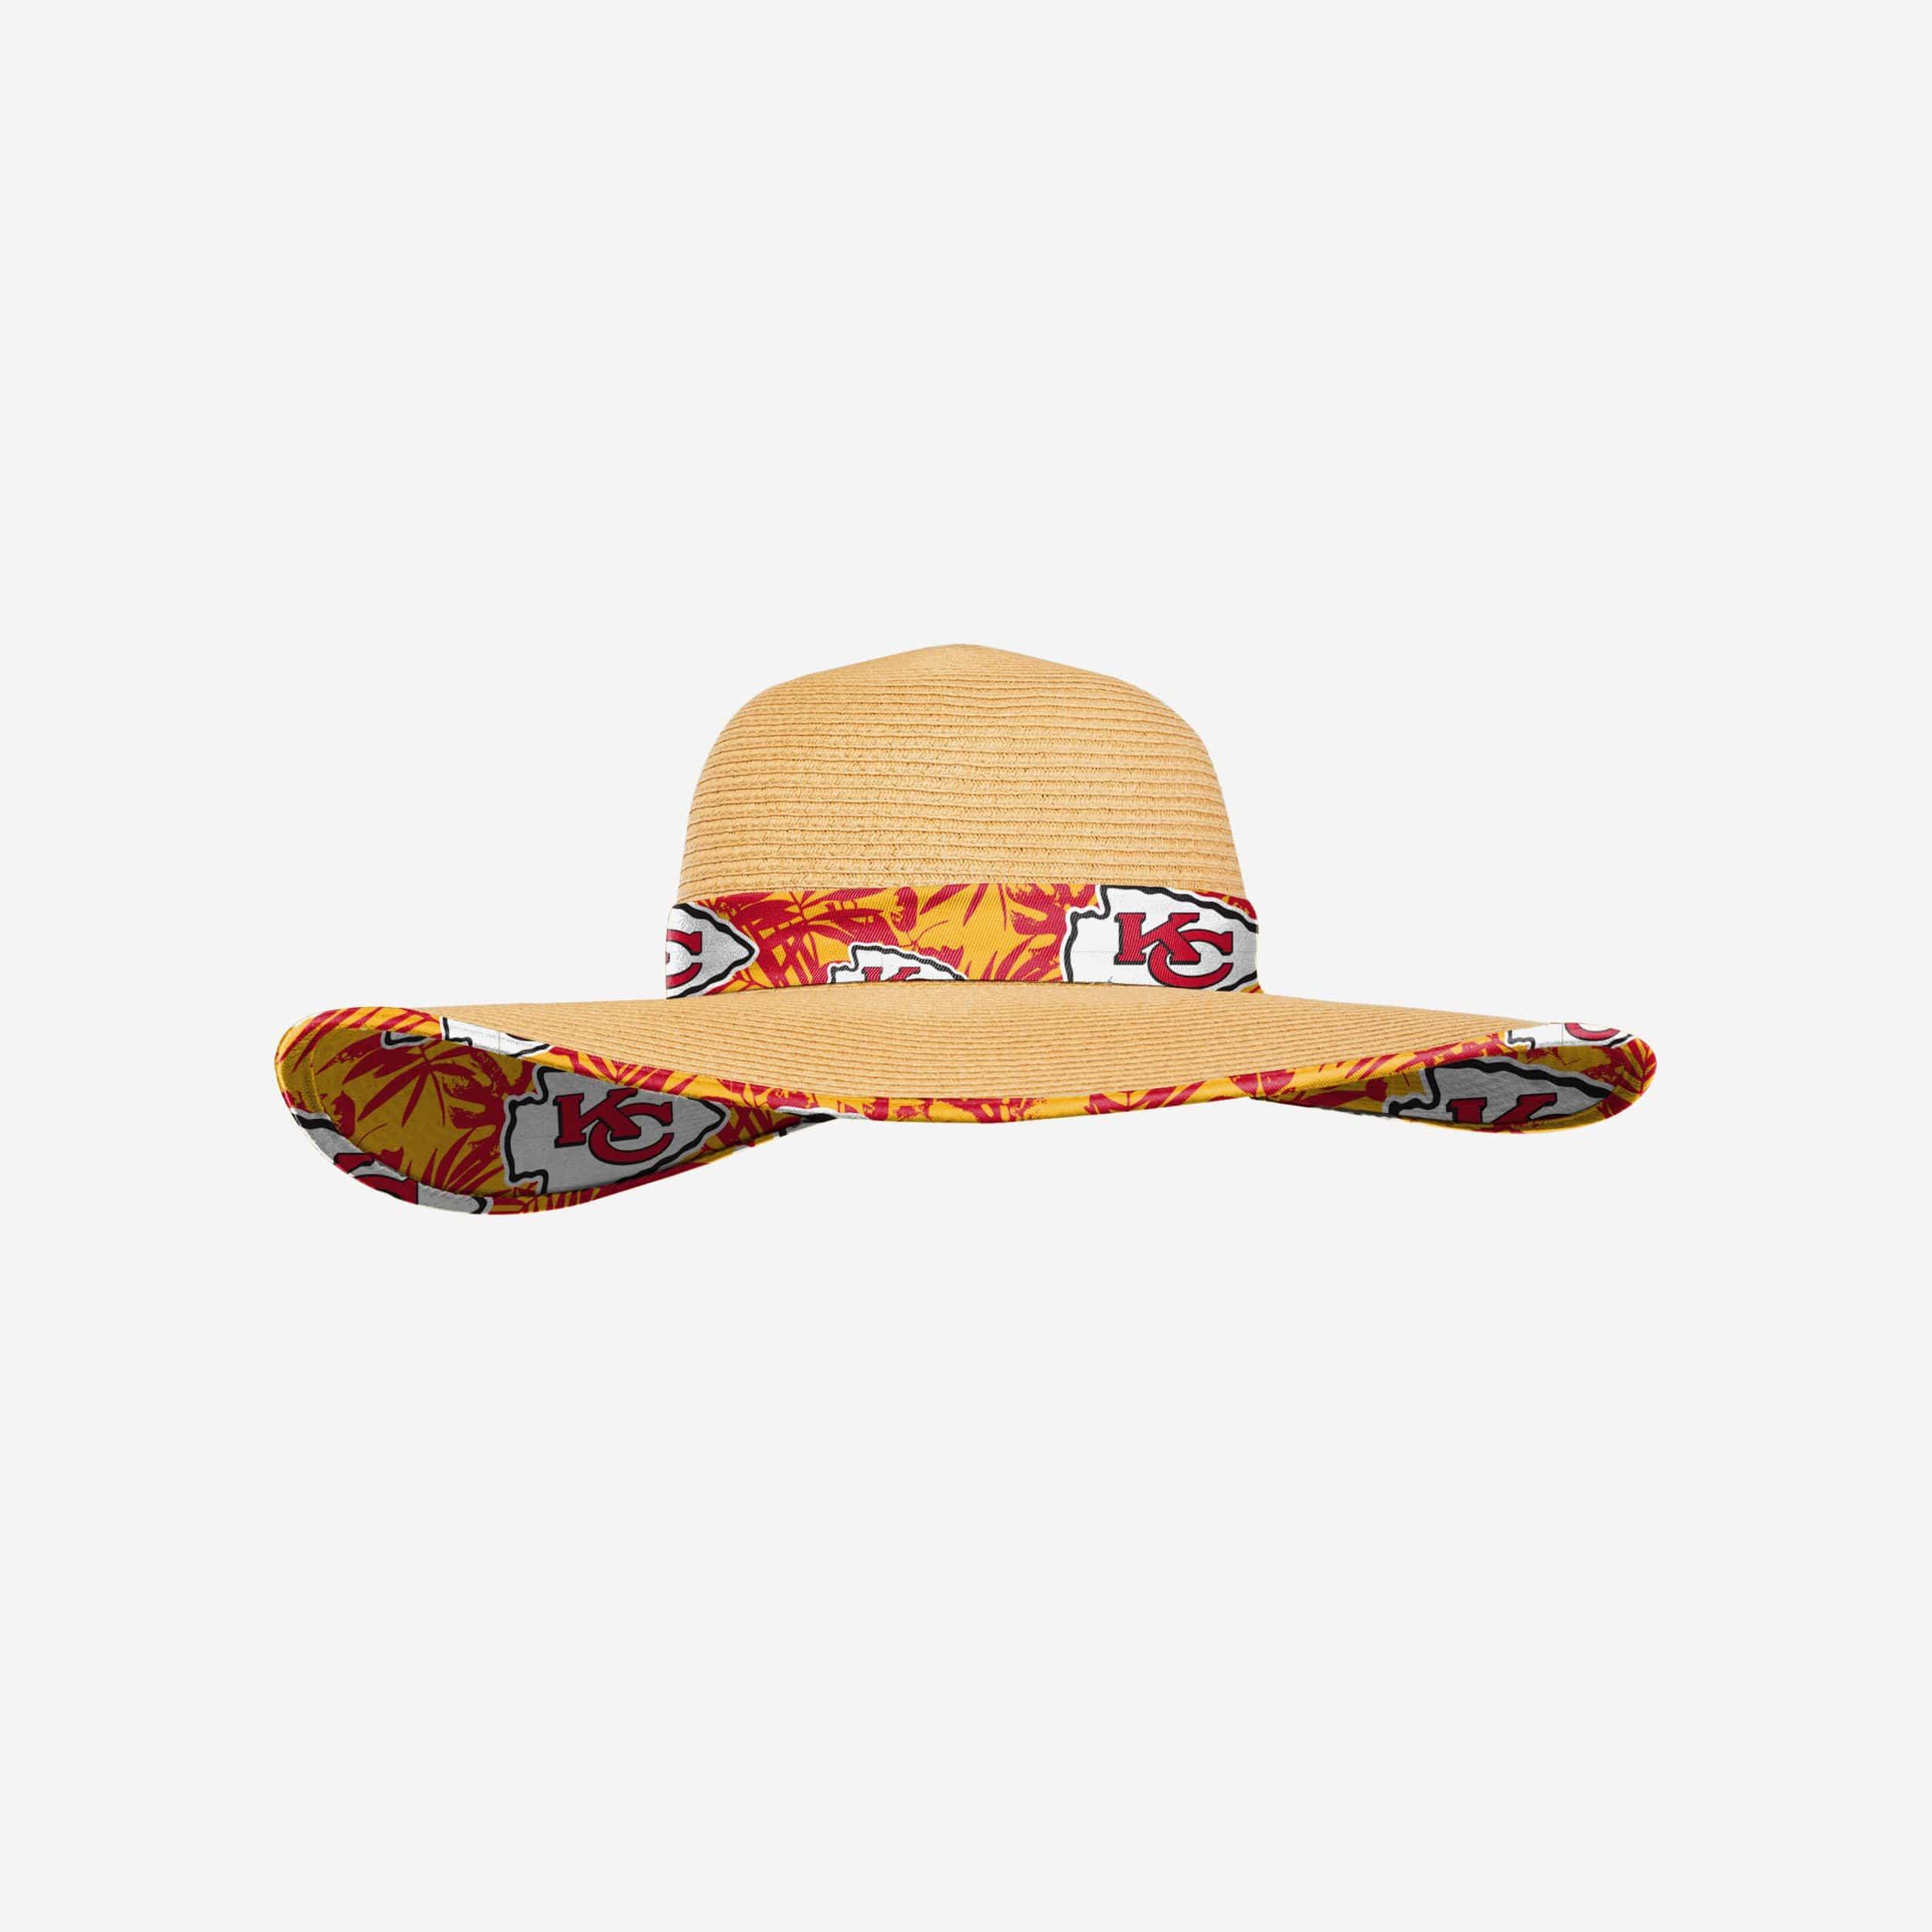 FOCO Kansas City Chiefs Womens Floral Straw Hat